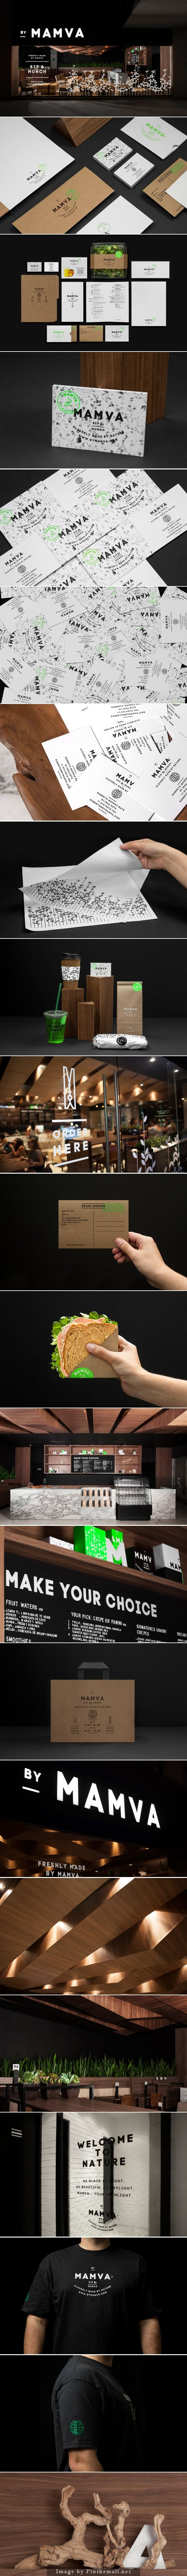 Mamva make your choice #identity #packaging #branding PD